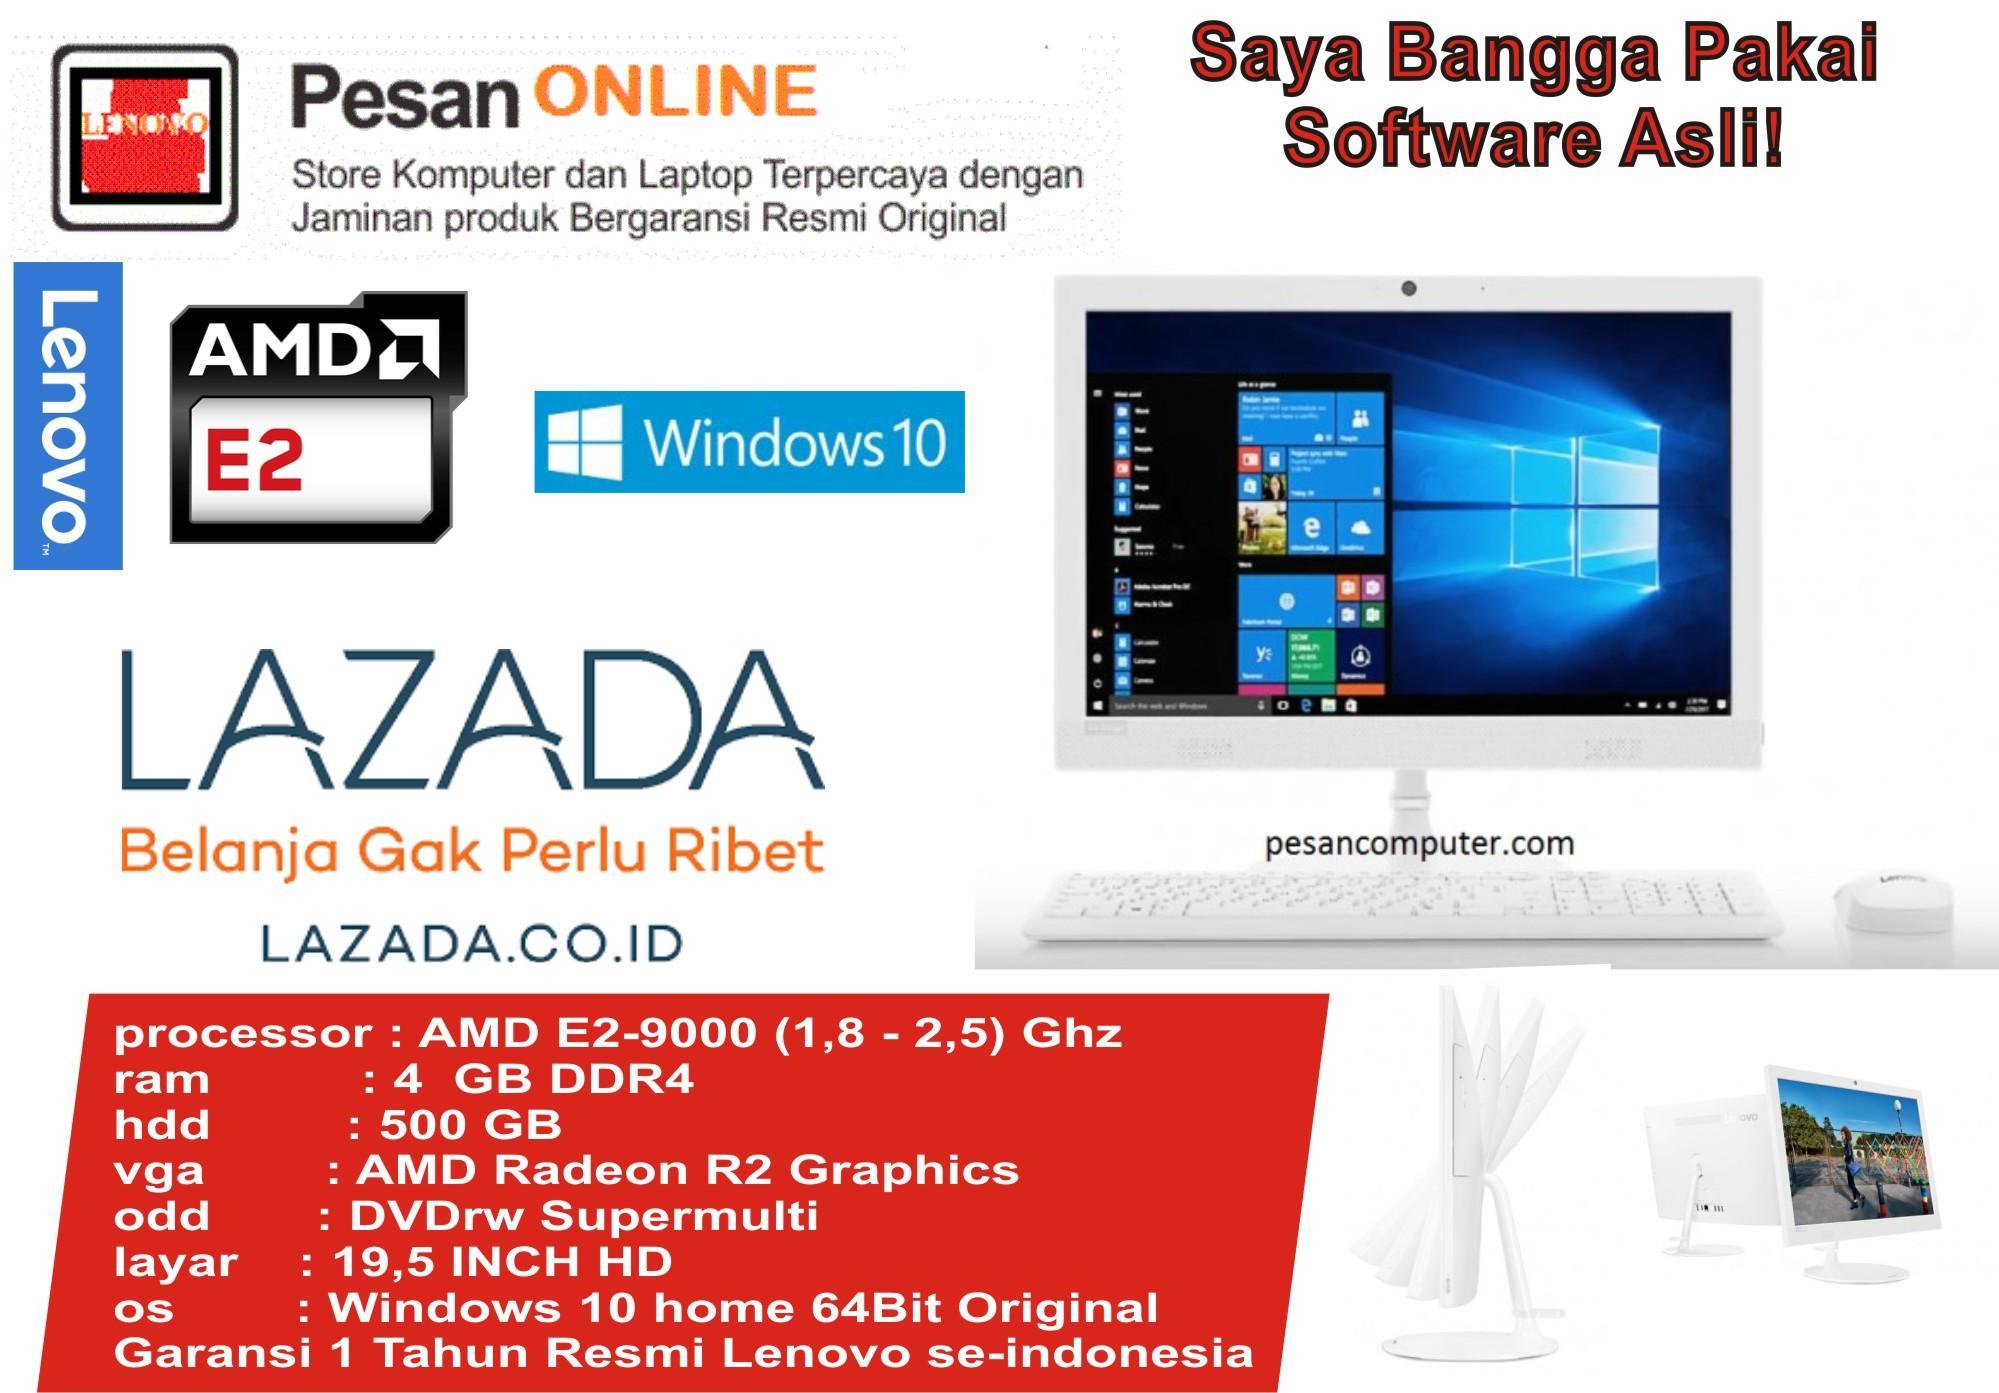 Lenovo AIO 330- AMD E2-9000 QUAD CORE F0D8001GID Desktop PC - Putih [19.5 Inch/ 4GB/ 500GB/ Win10] Garansi Resmi Lenovo Indonesia